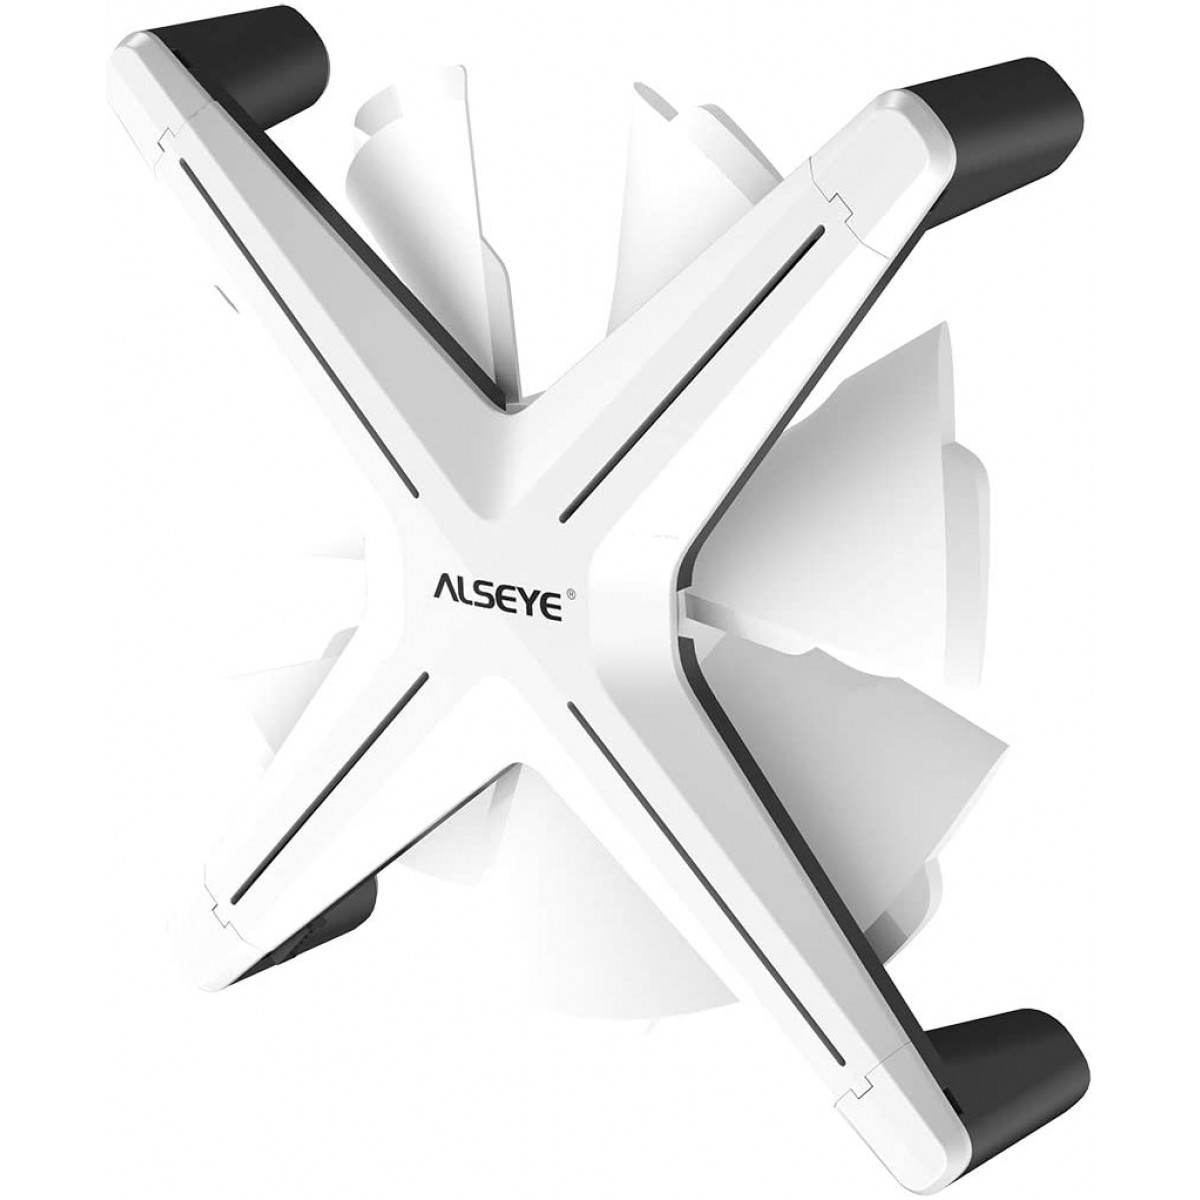 Kit Fan com 3 Unidades Alseye X12, ARGB, White, 120mm